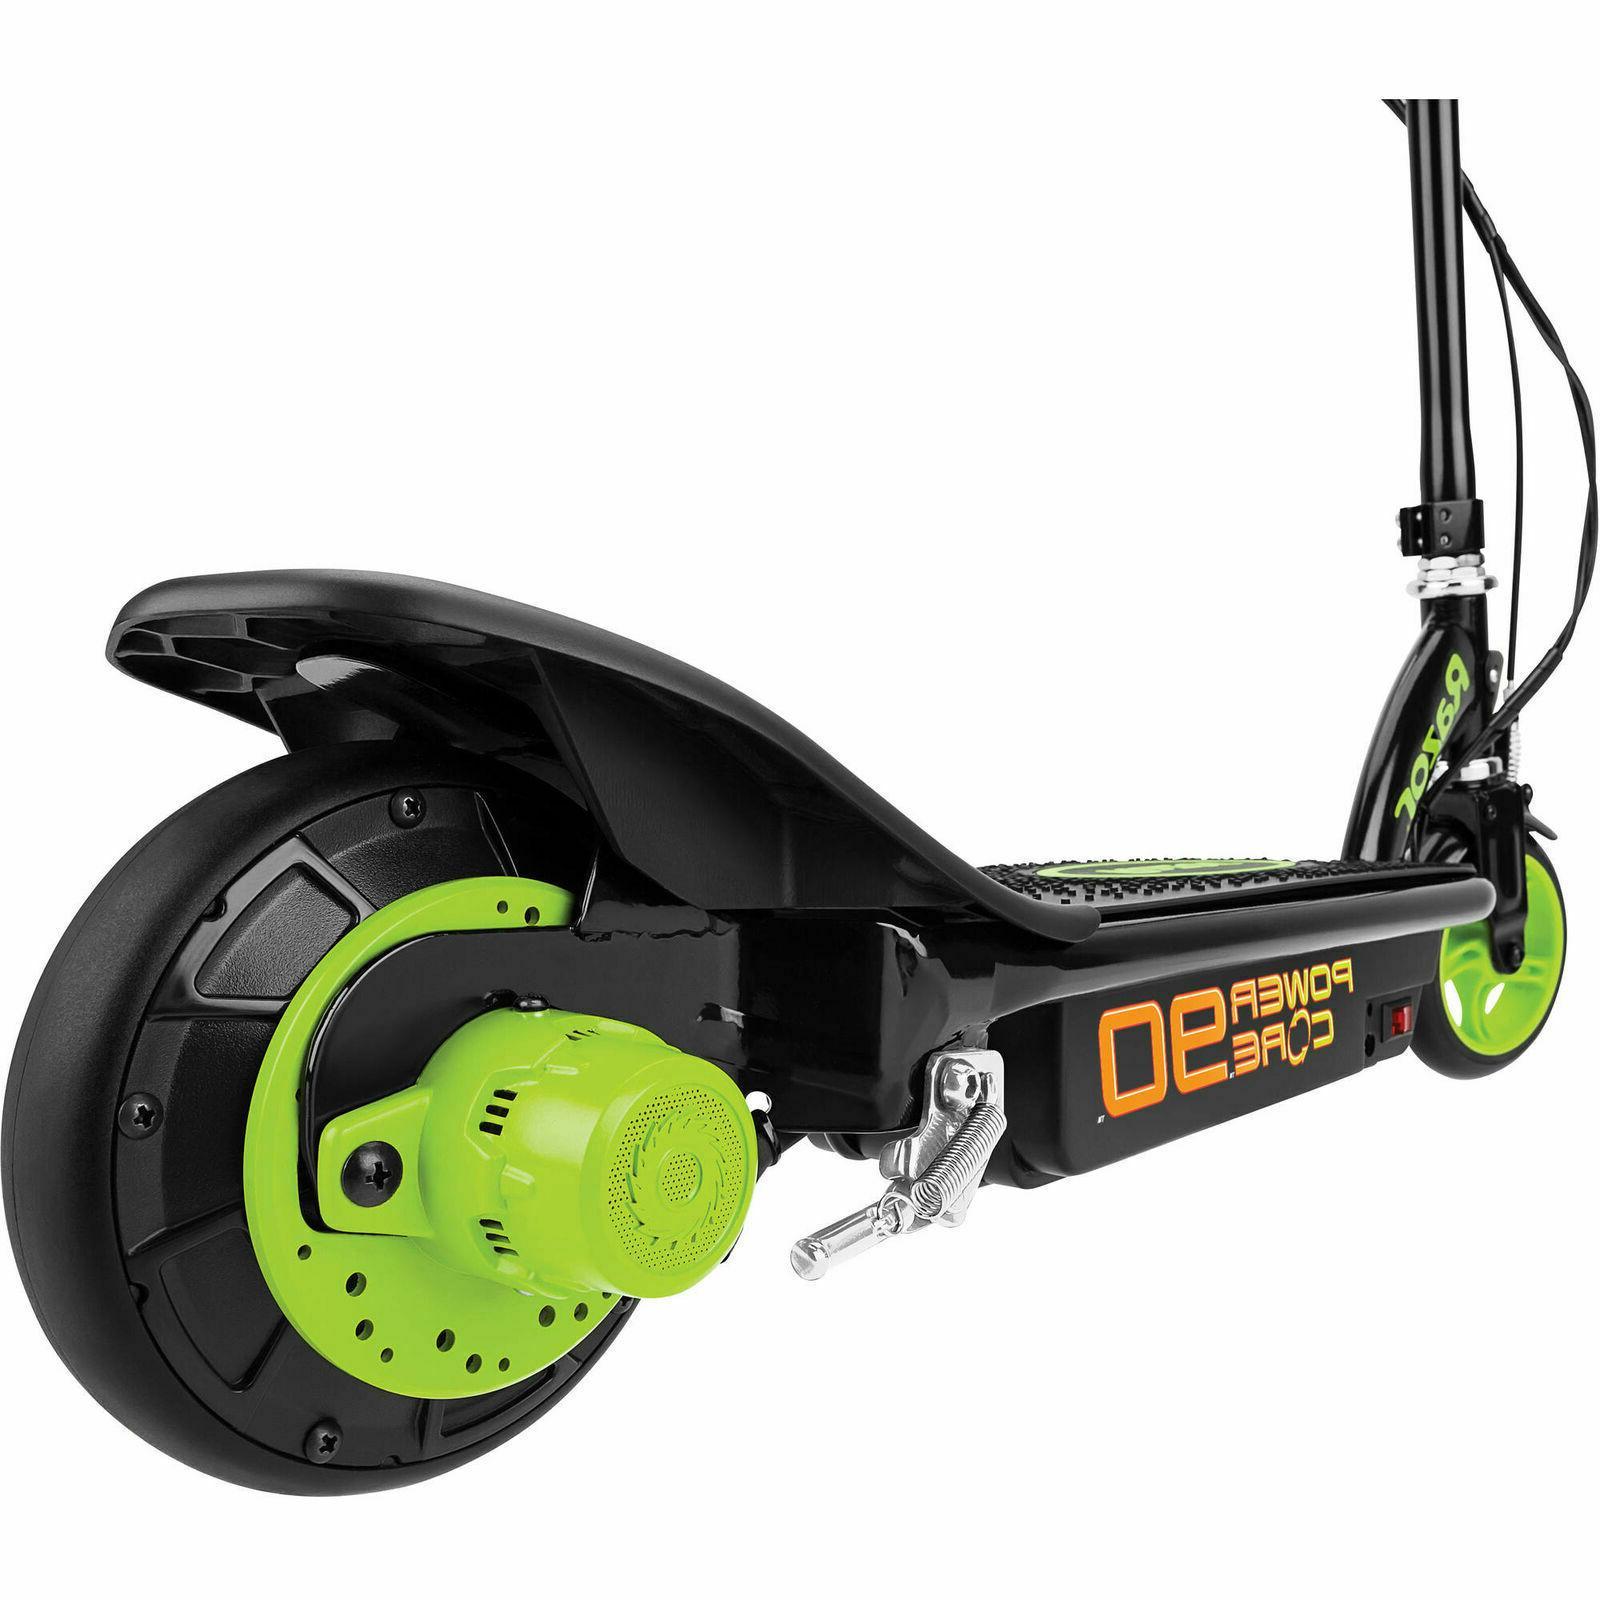 Scooter Electric Rear Wheel 80 Min 10 MPH Razor